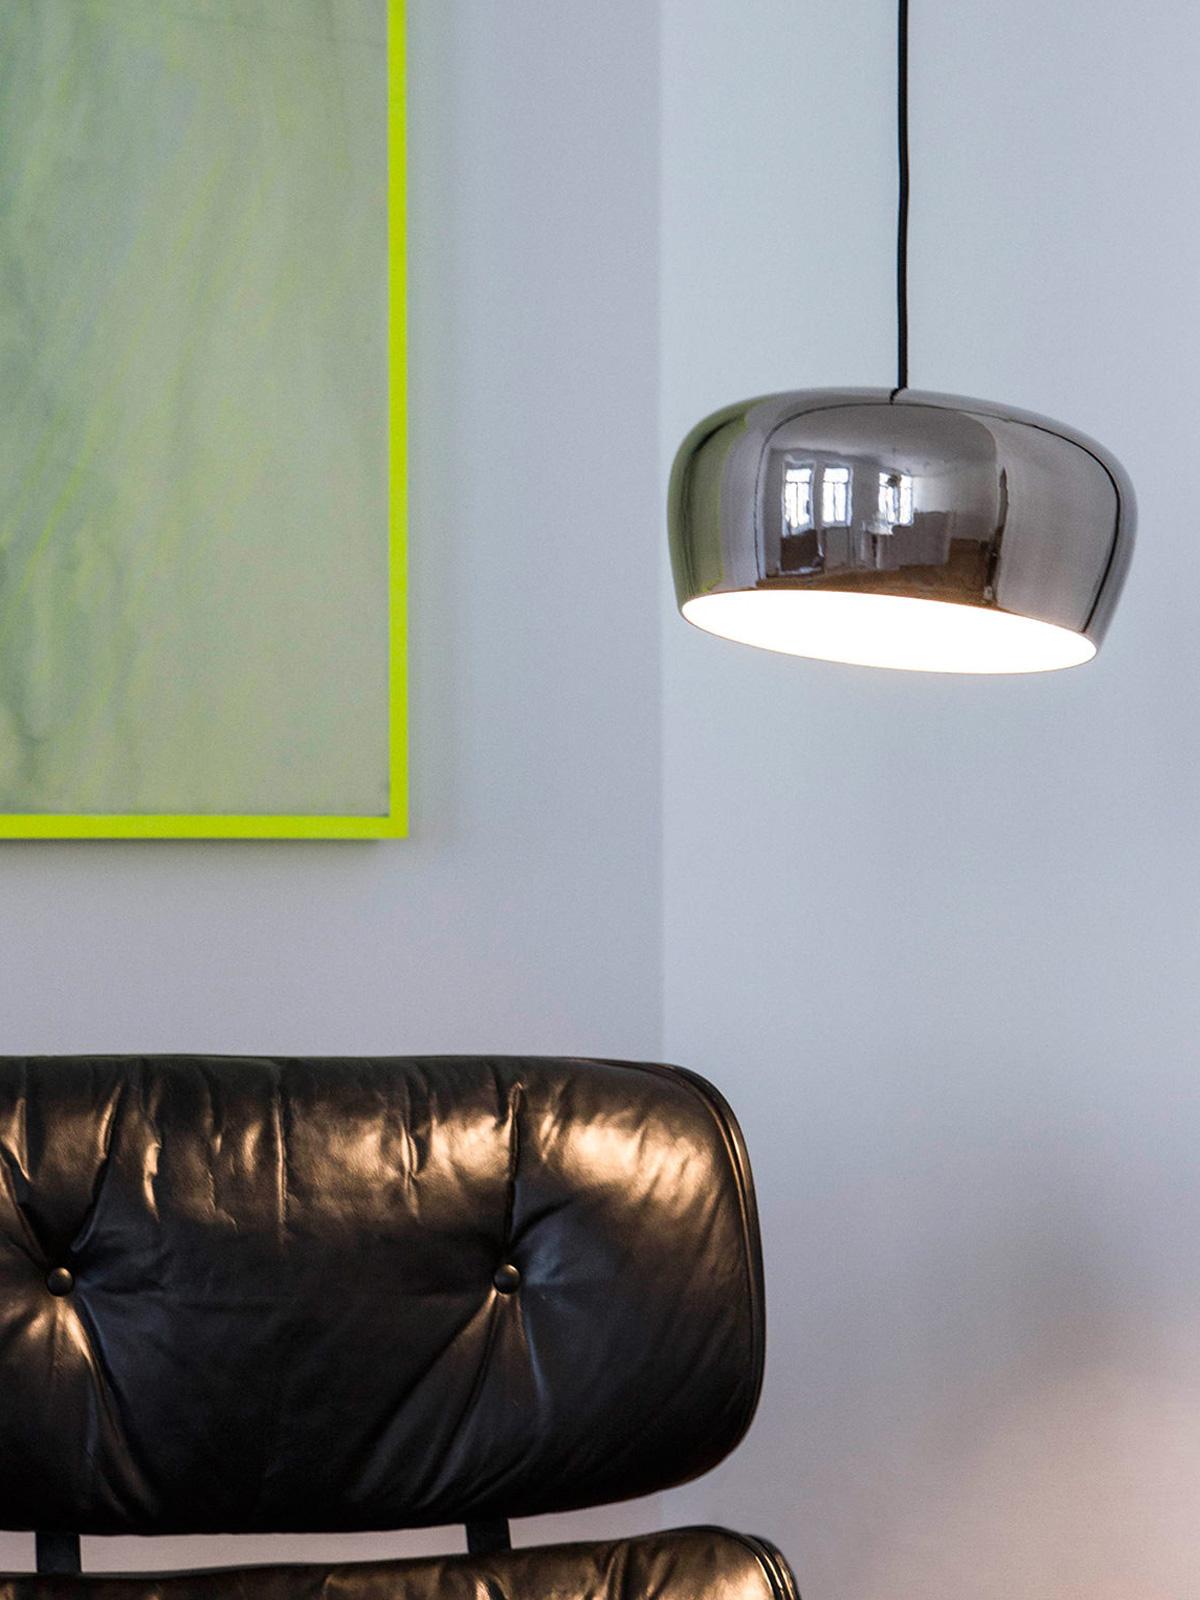 DesignOrt Blog: Designerleuchten mit variablem Lampenschirm Formagenda Coppola Lampe